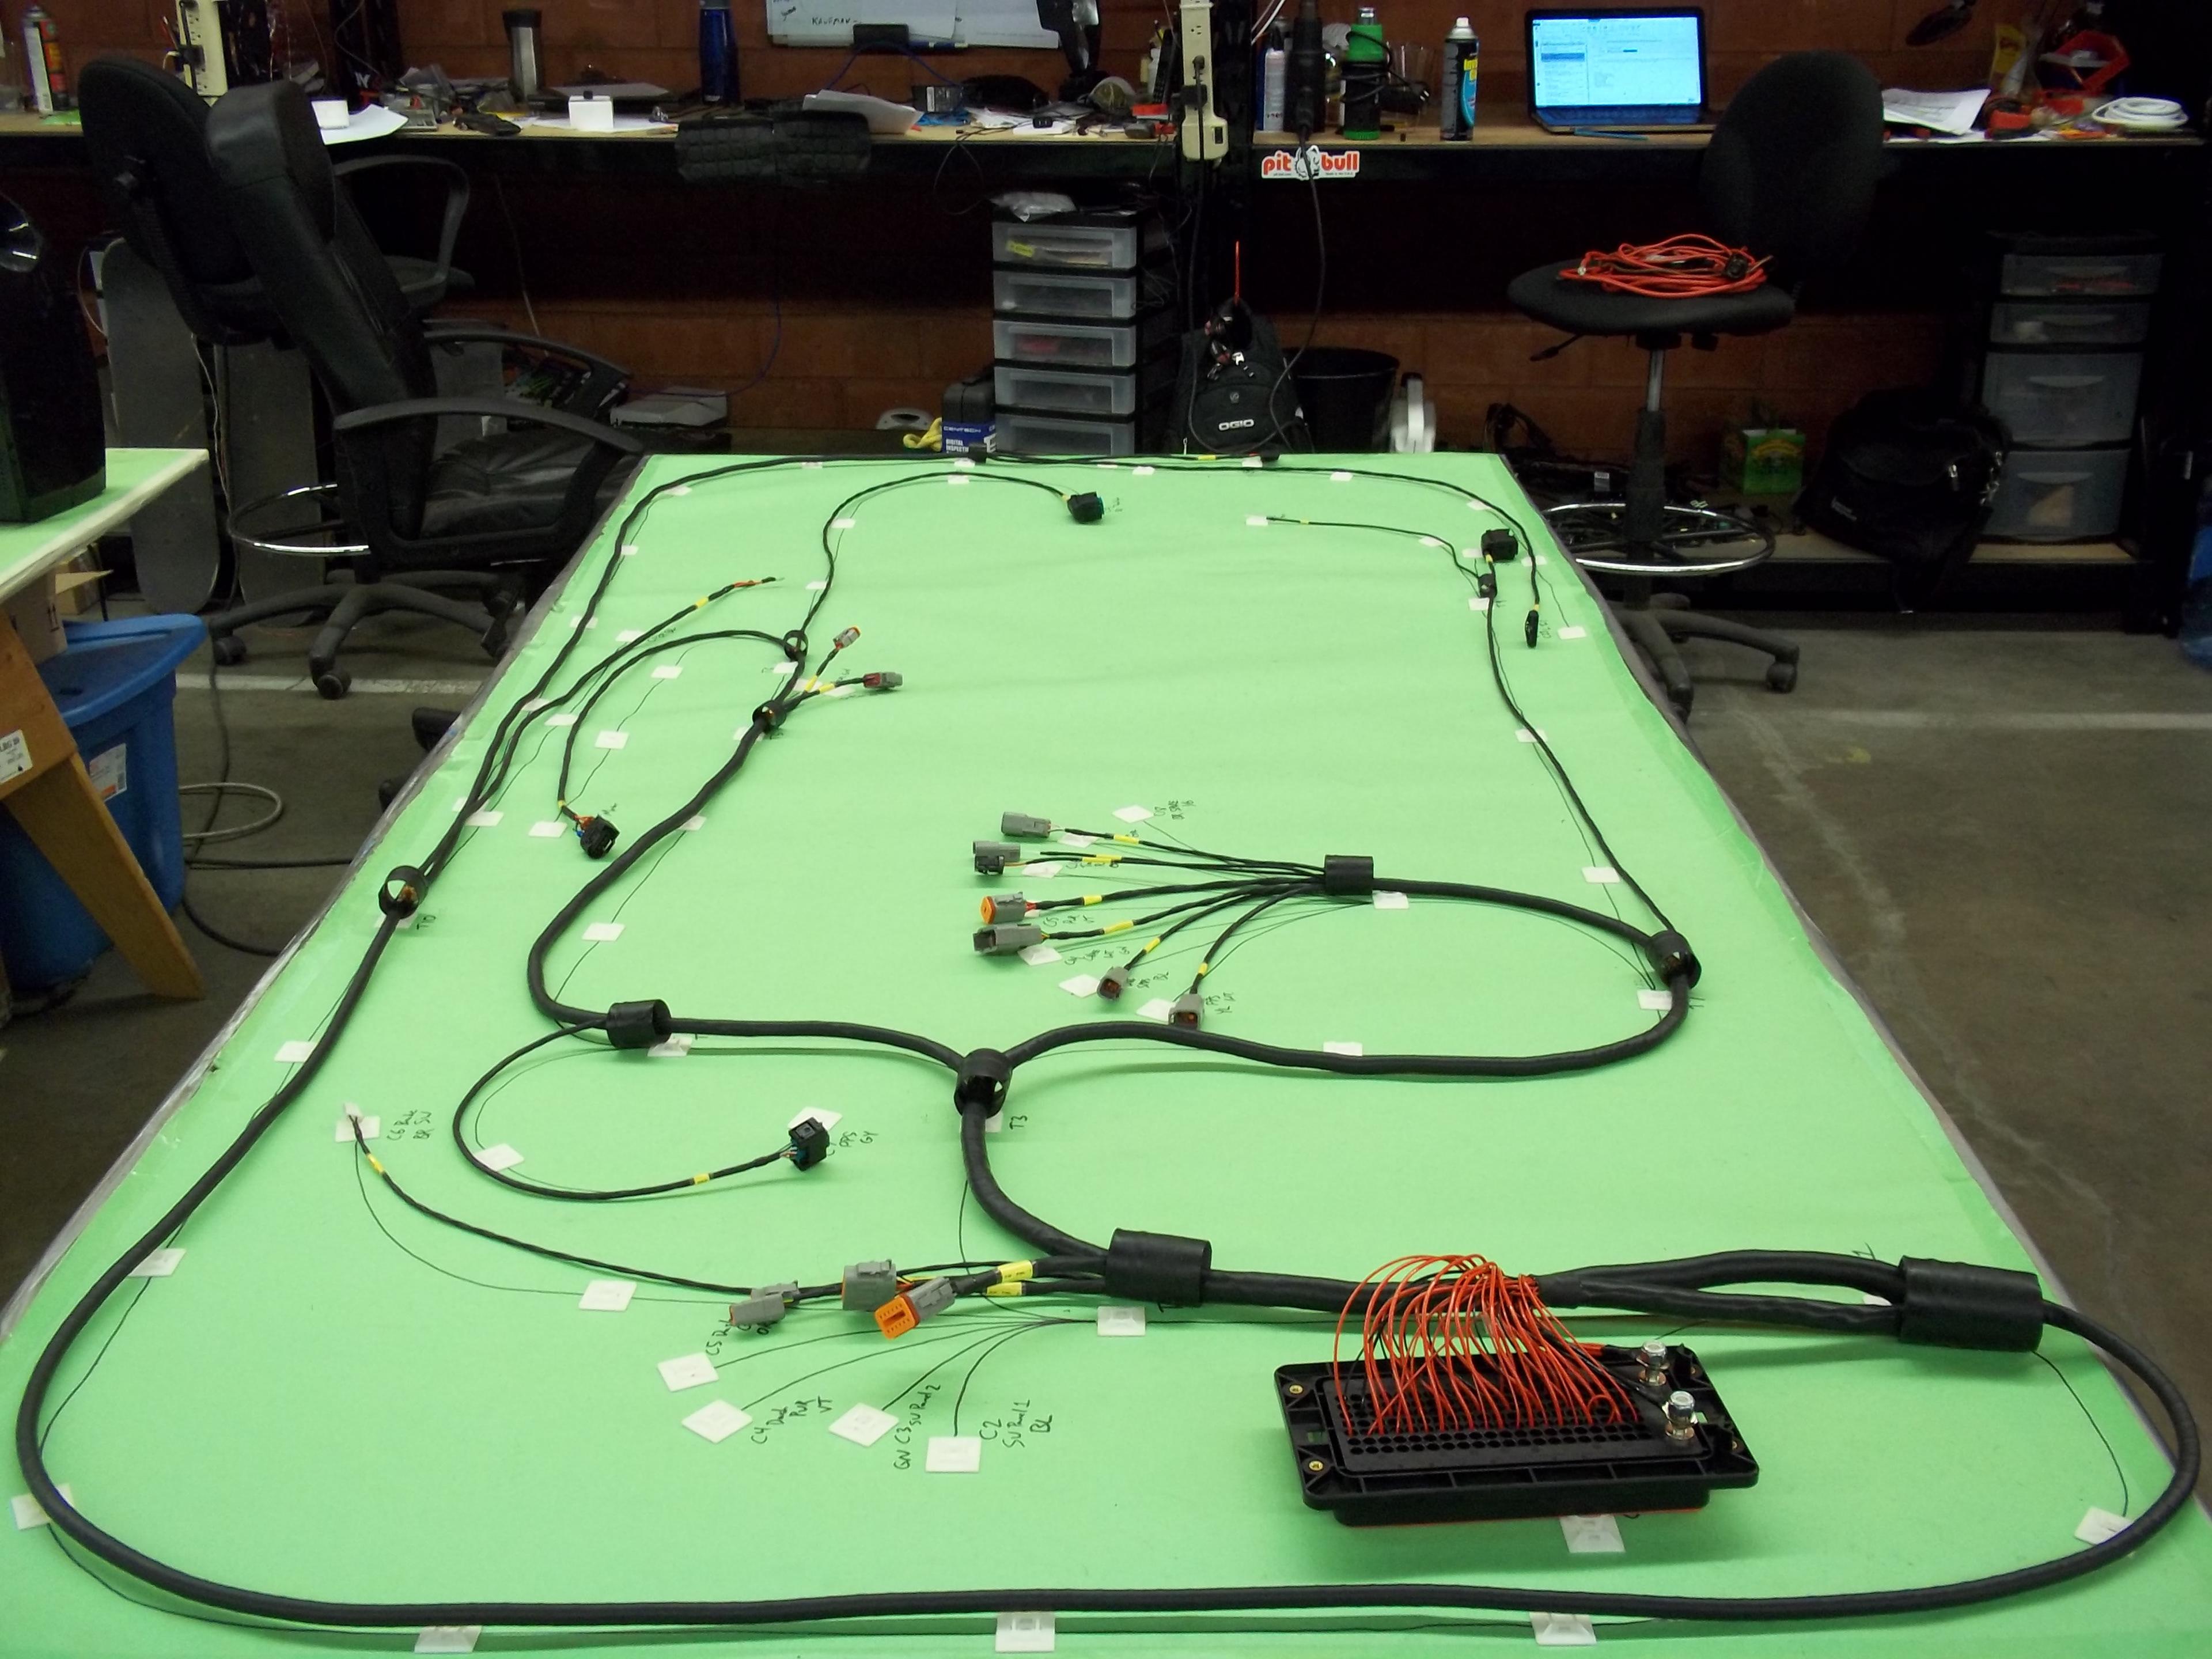 Zac perkins portfolio motorsports electronics mil spec pectel sq6m system integrated e92 m3 motorsports wiring harness keyboard keysfo Choice Image